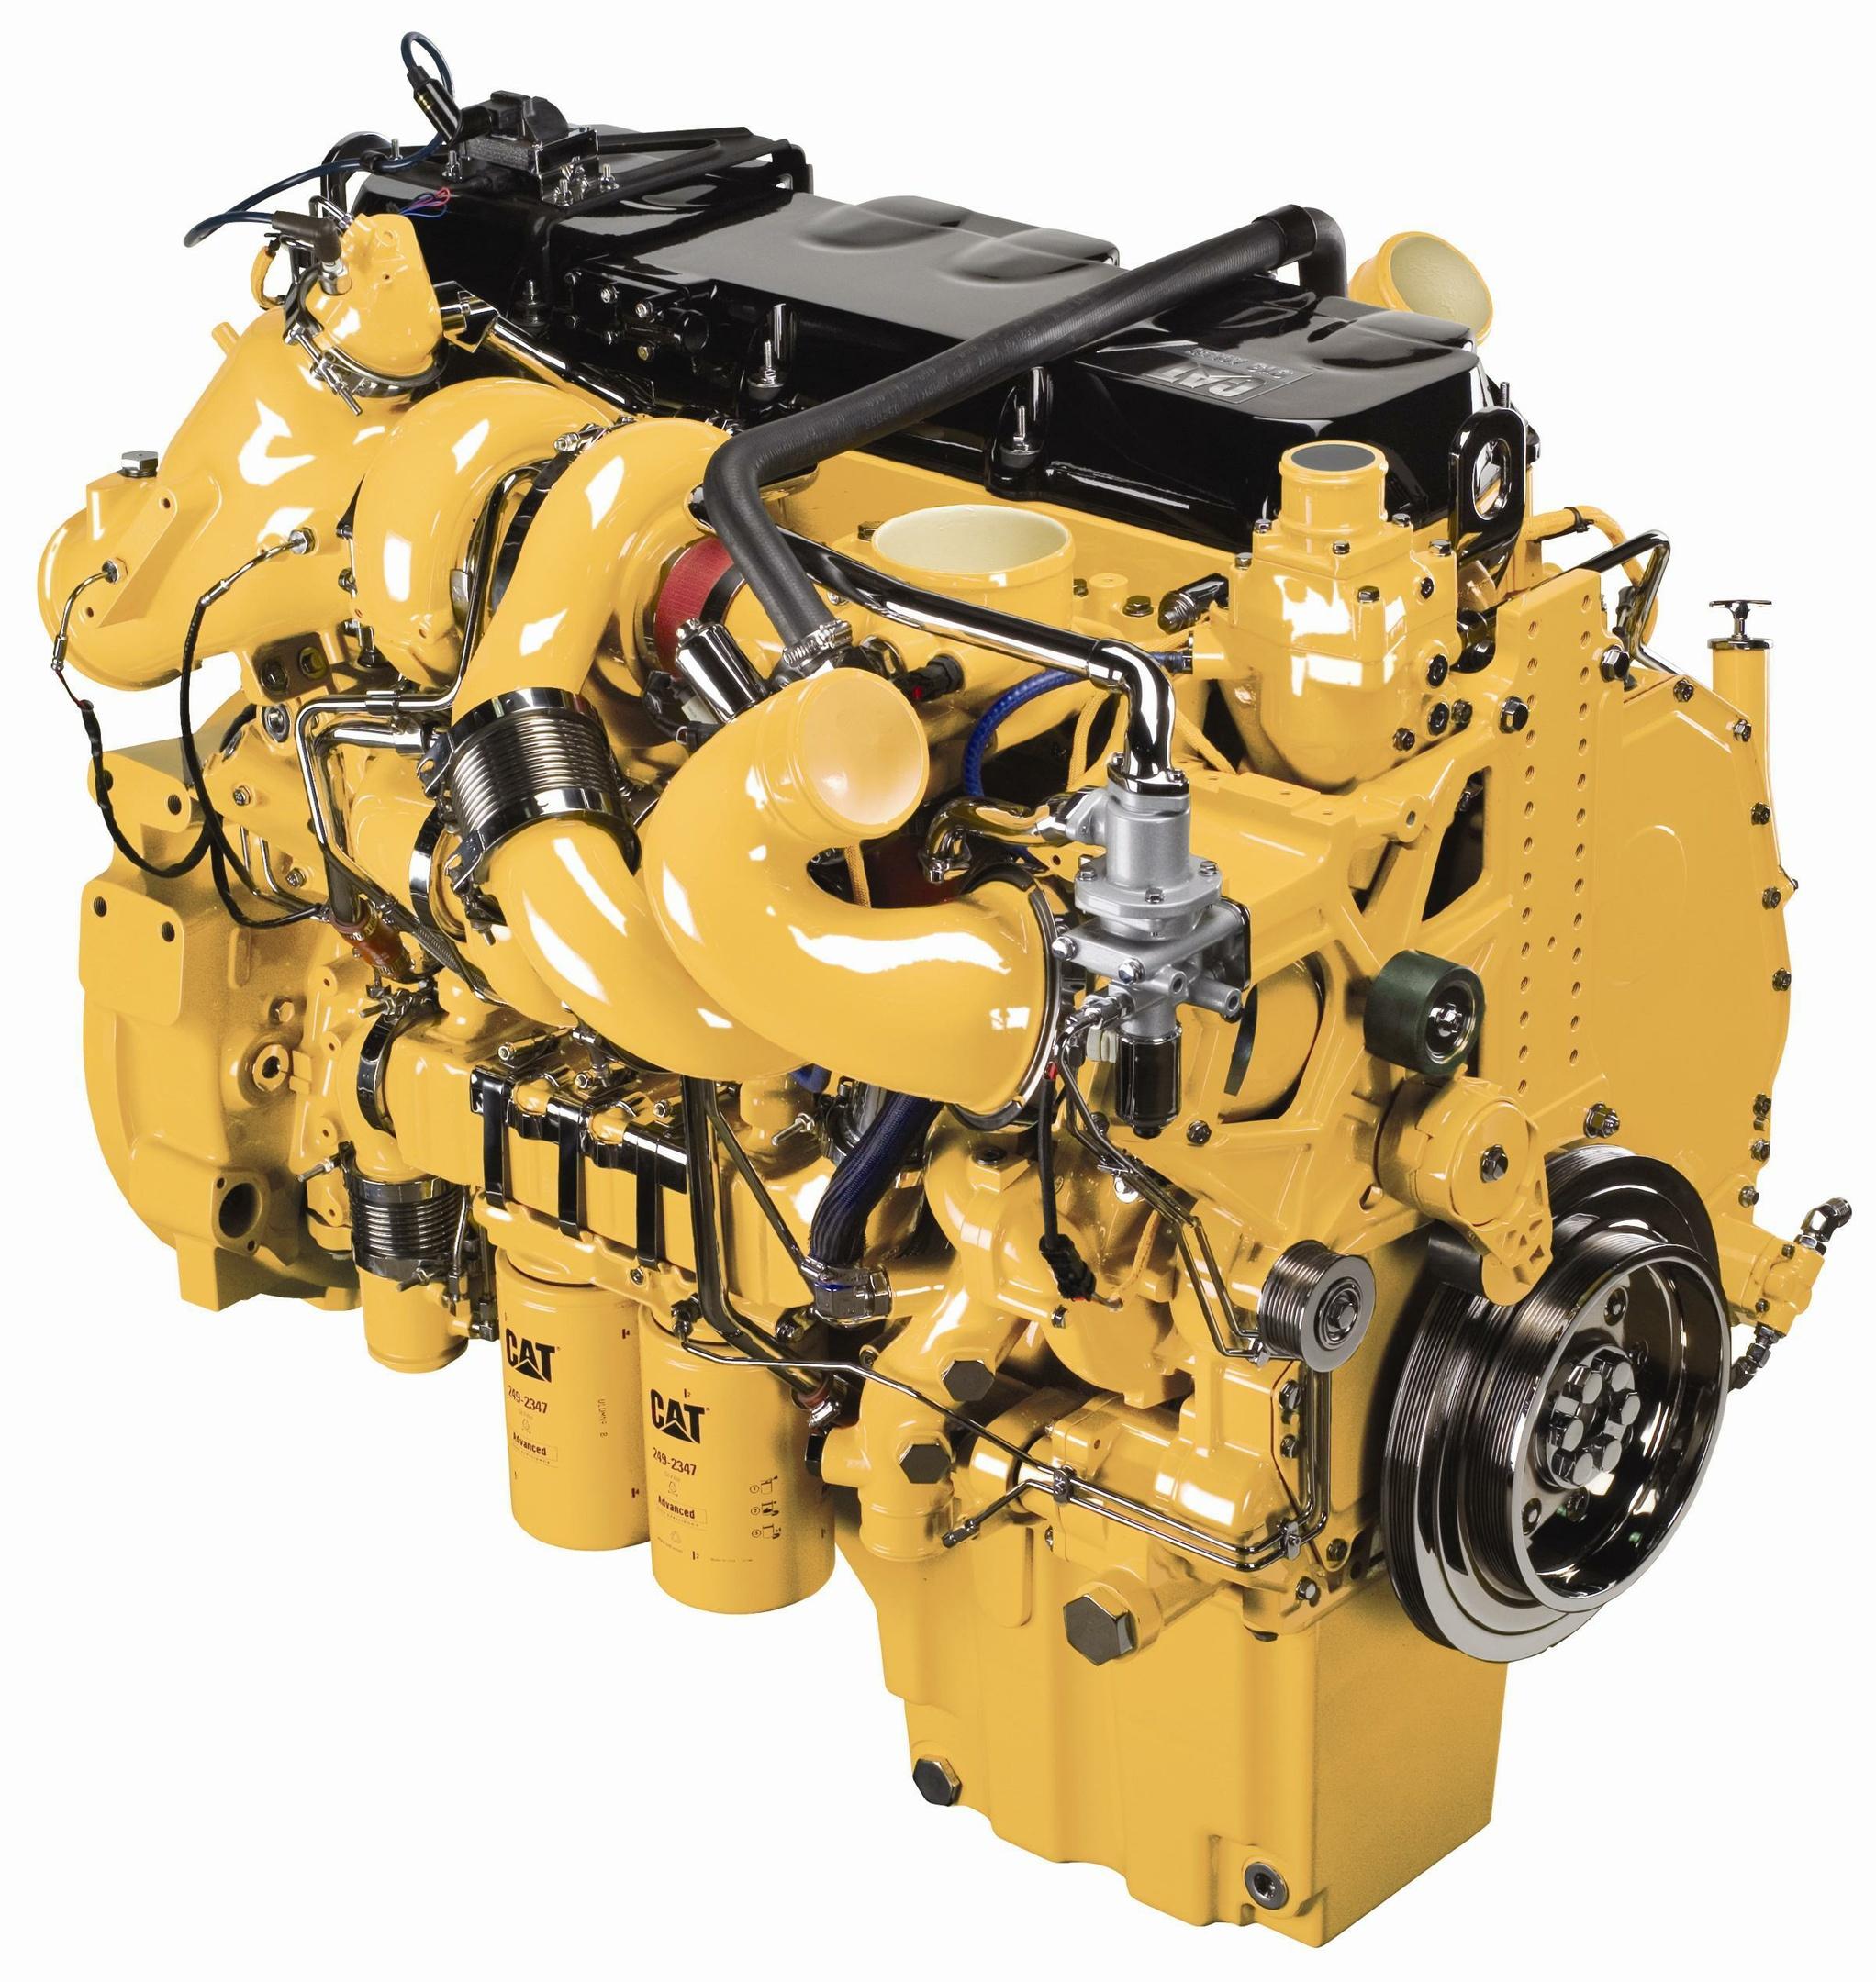 C11 Cat Engine Diagram Schematics Wiring Diagrams Truck Caterpillar C13 C15 Troubleshoo Rh Sellfy Com Manual Acert